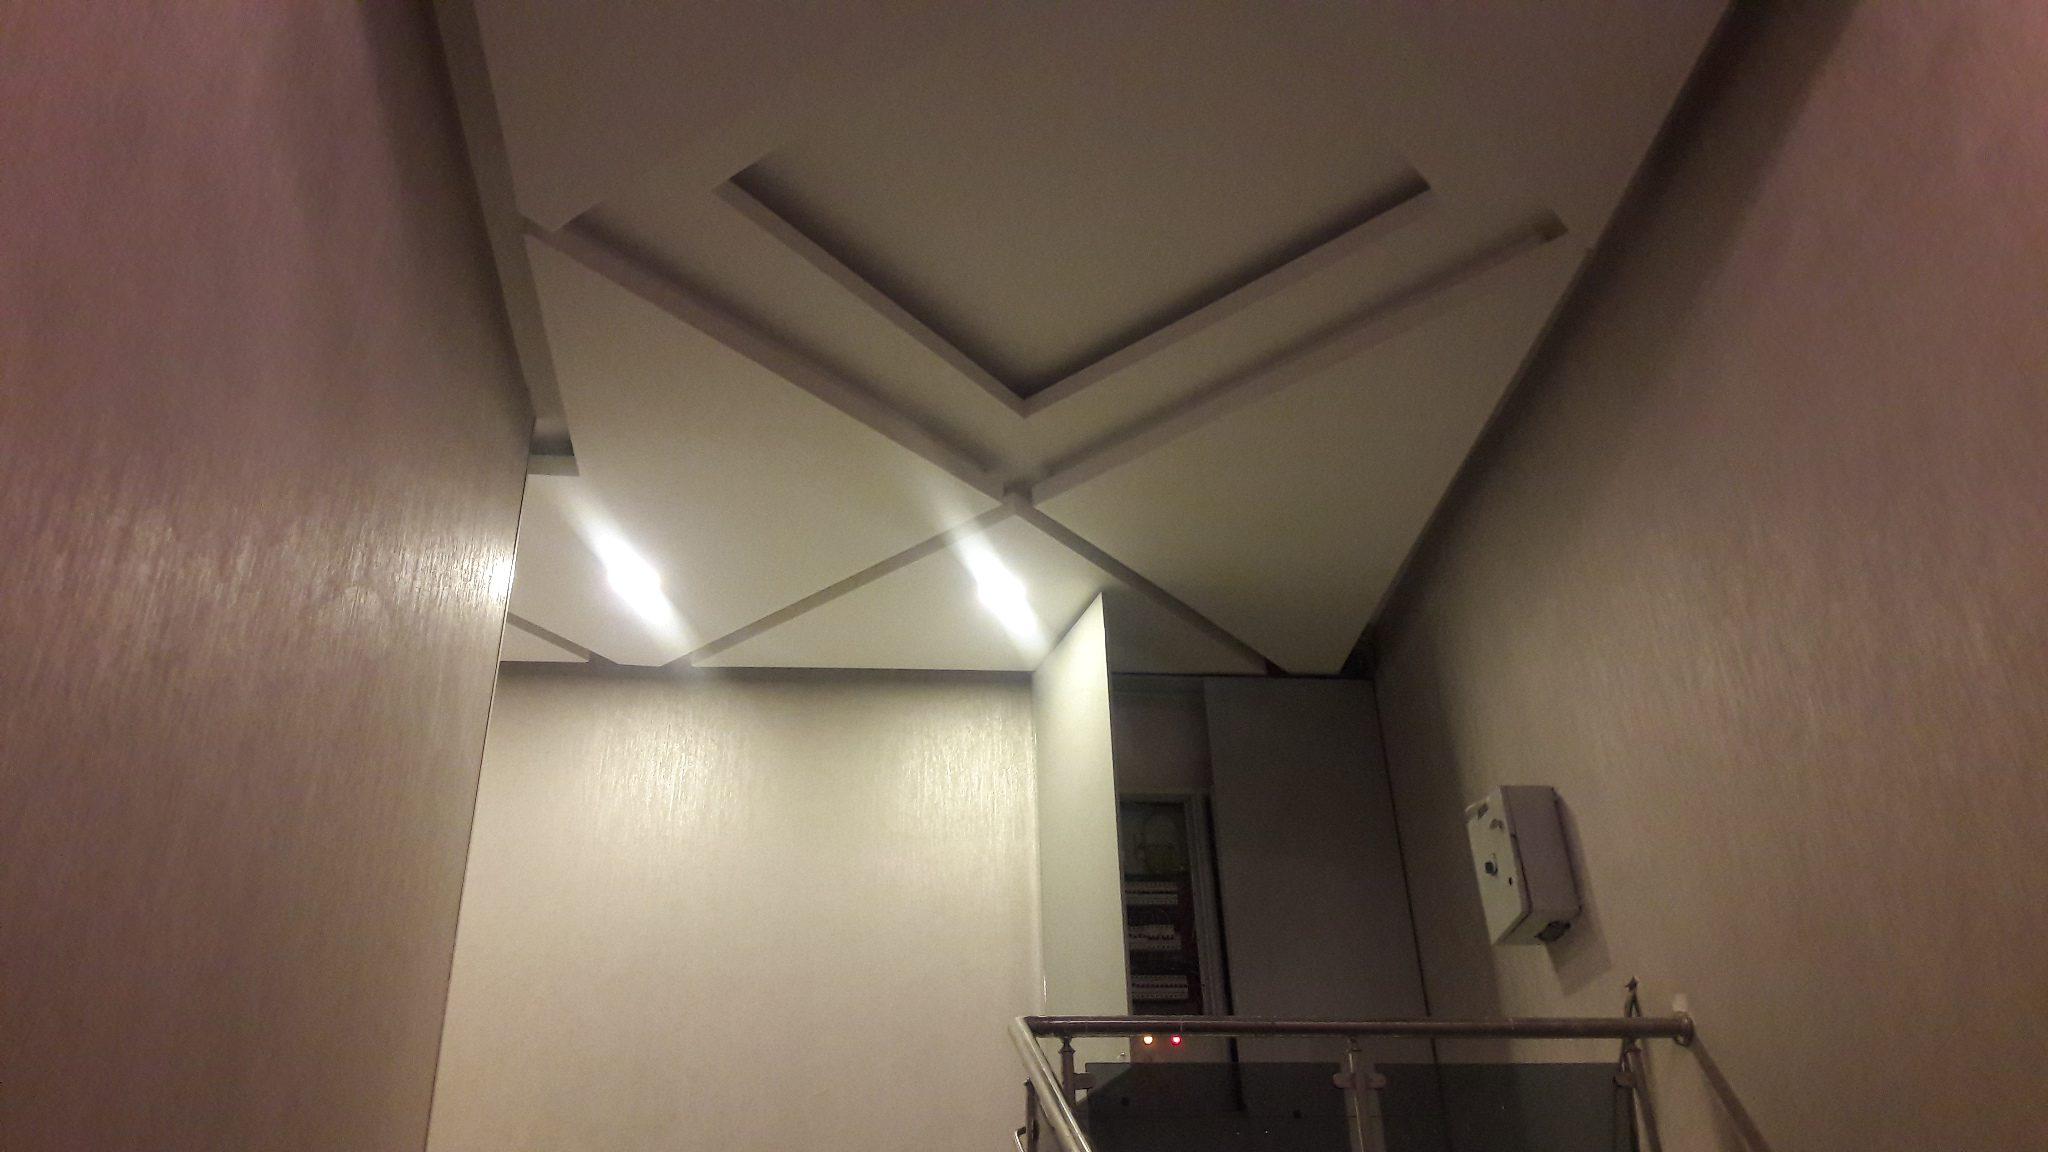 Merdiven başı asma tavan